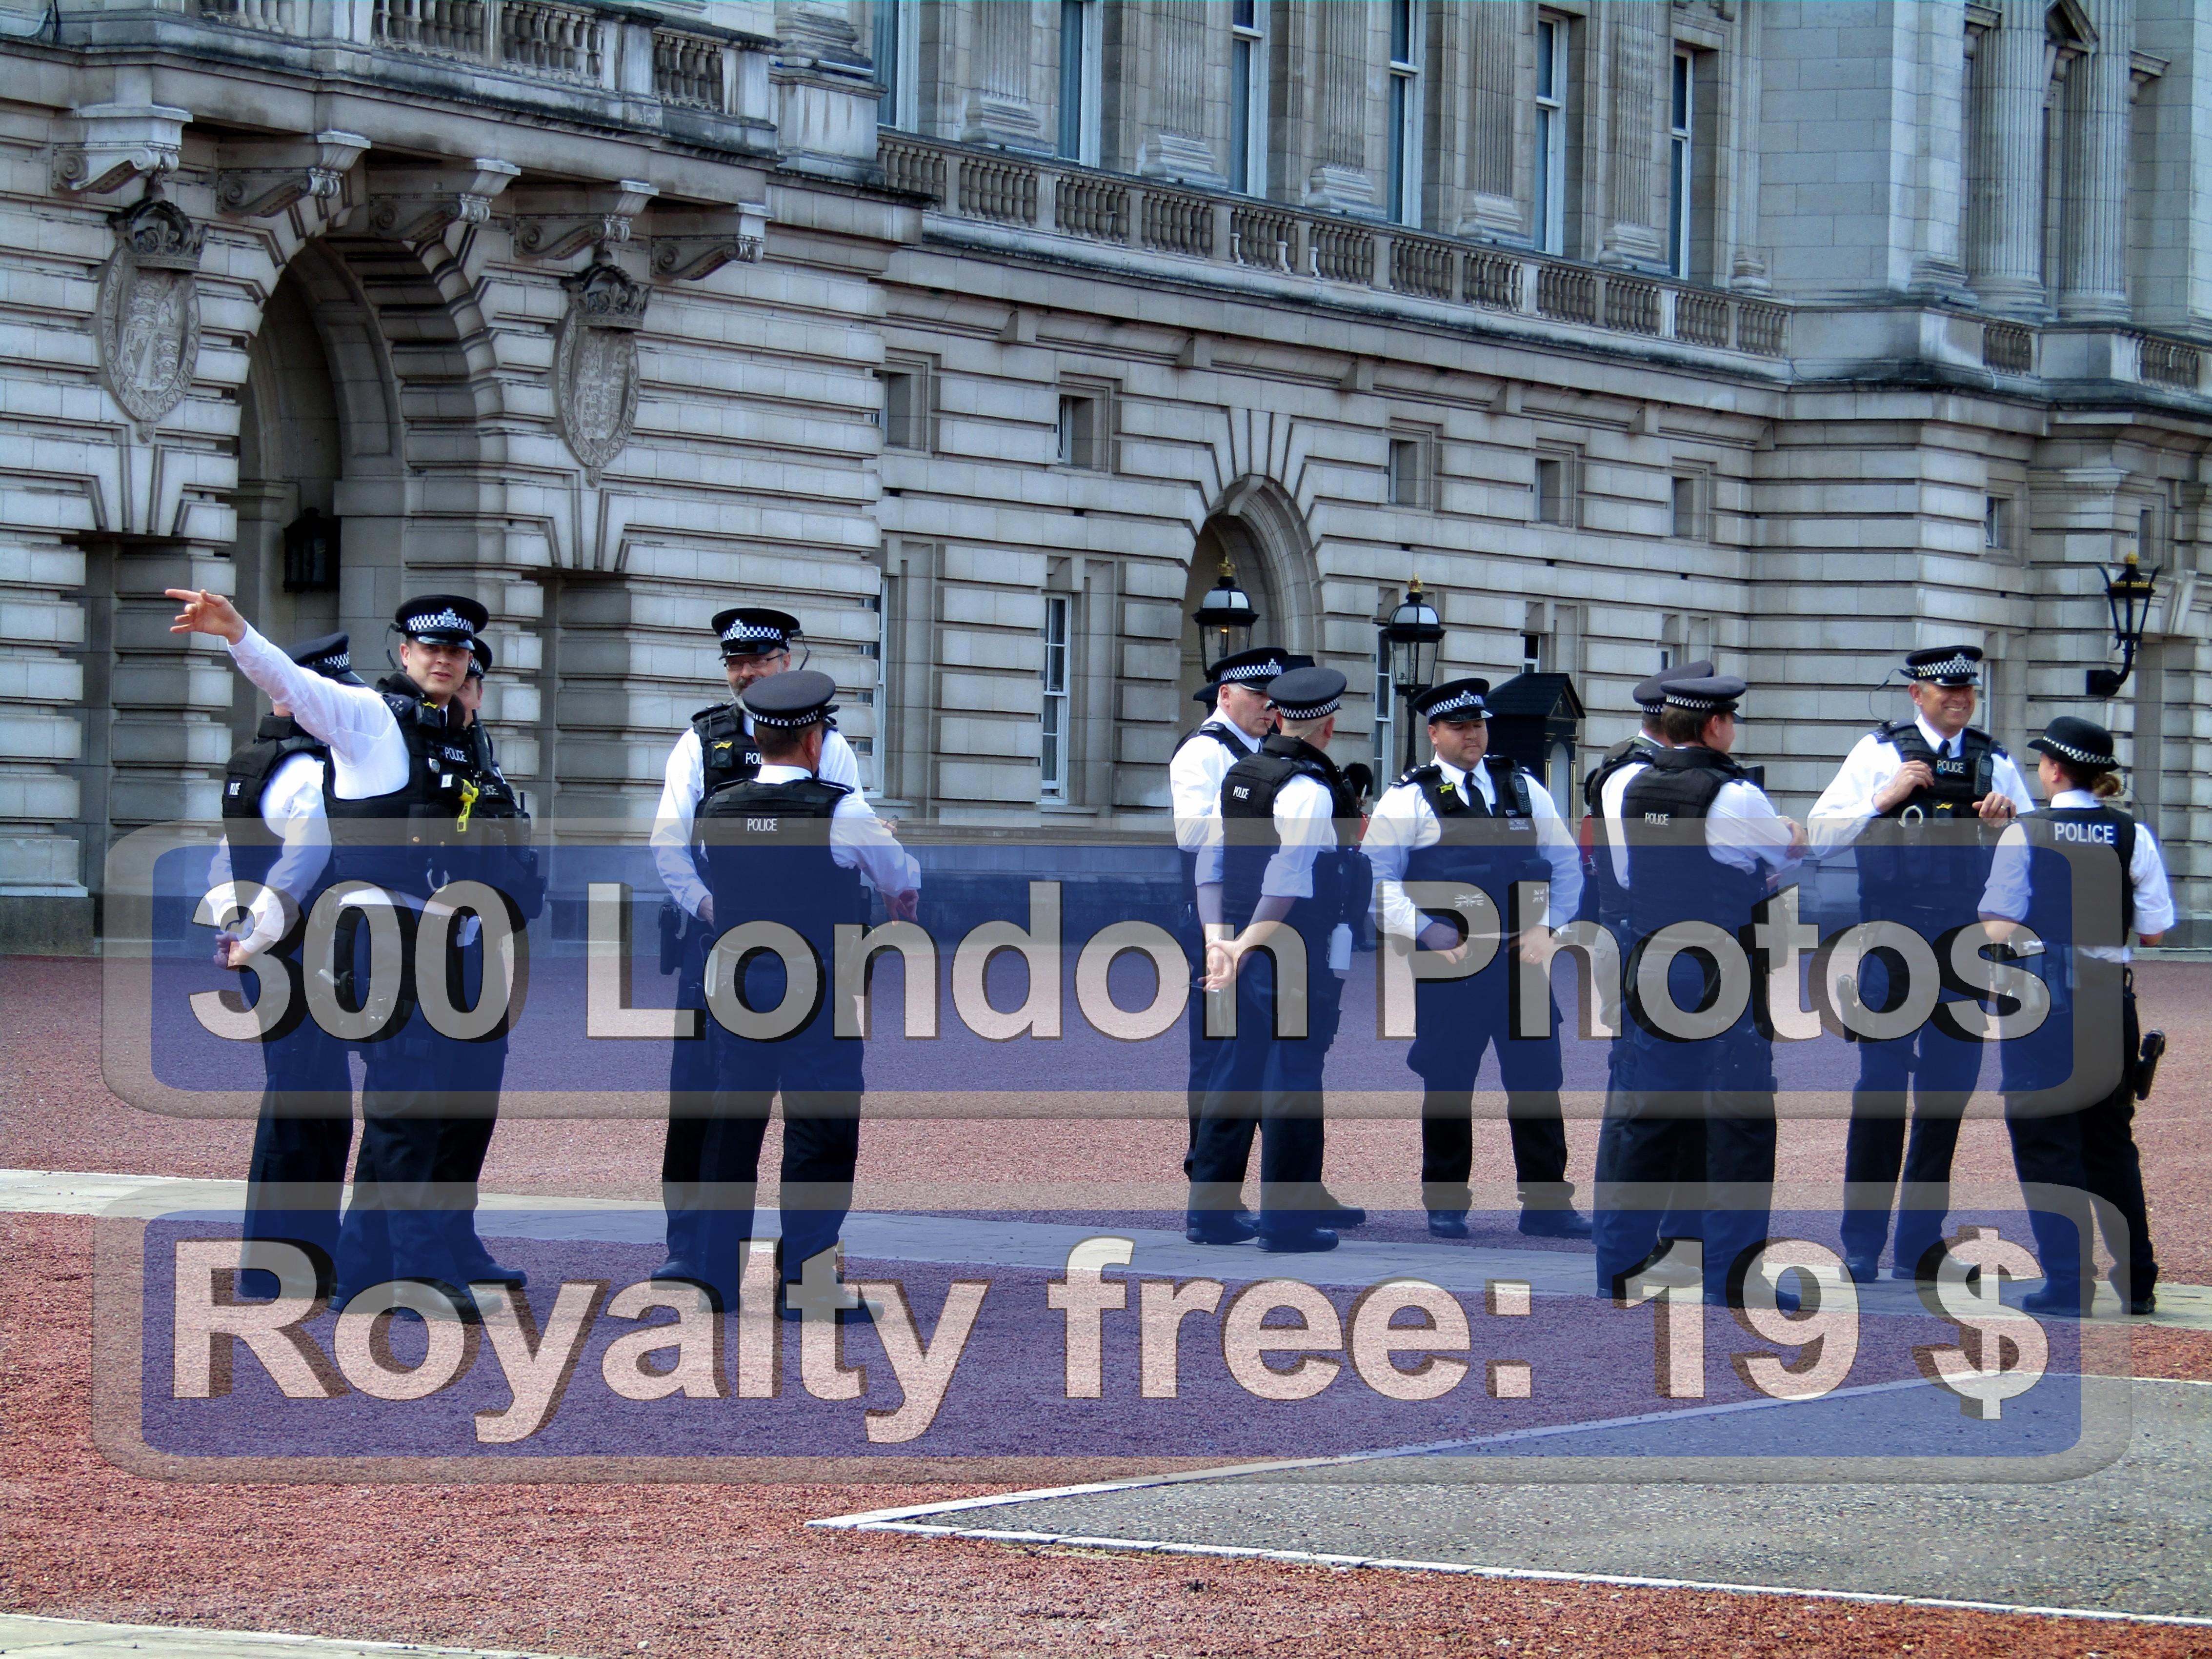 London Photo De Profil